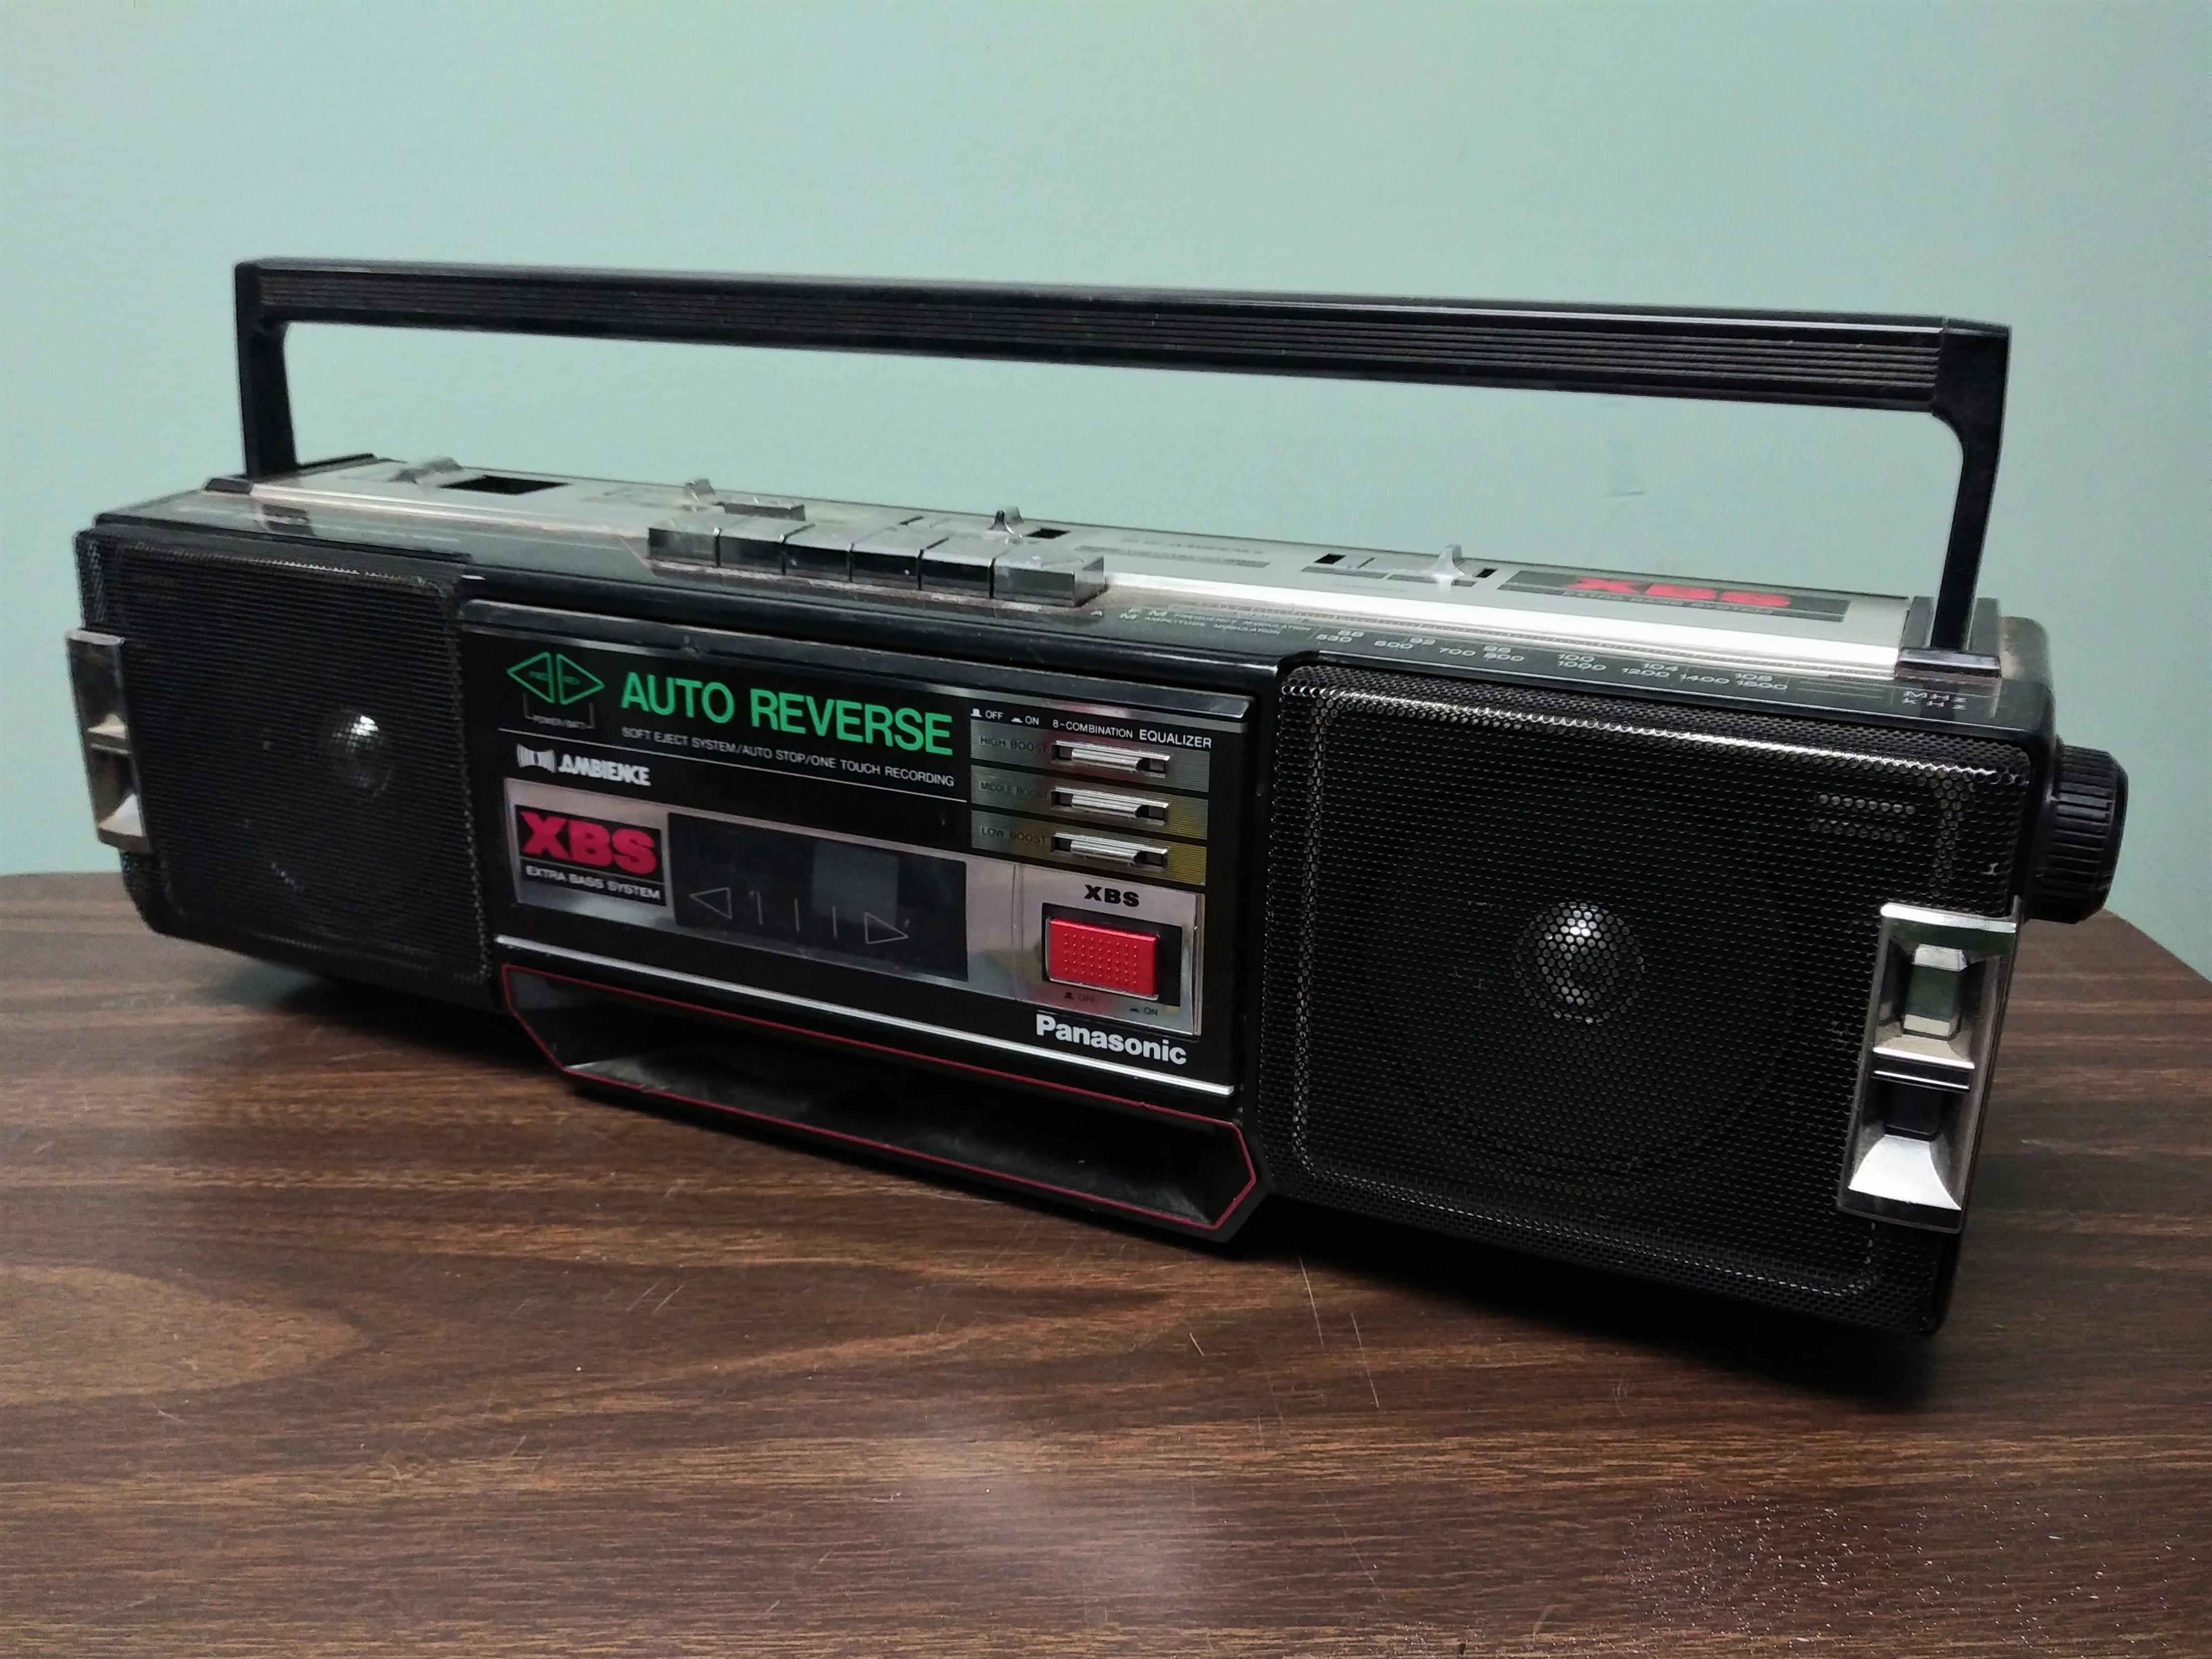 Panasonic XBS Boombox